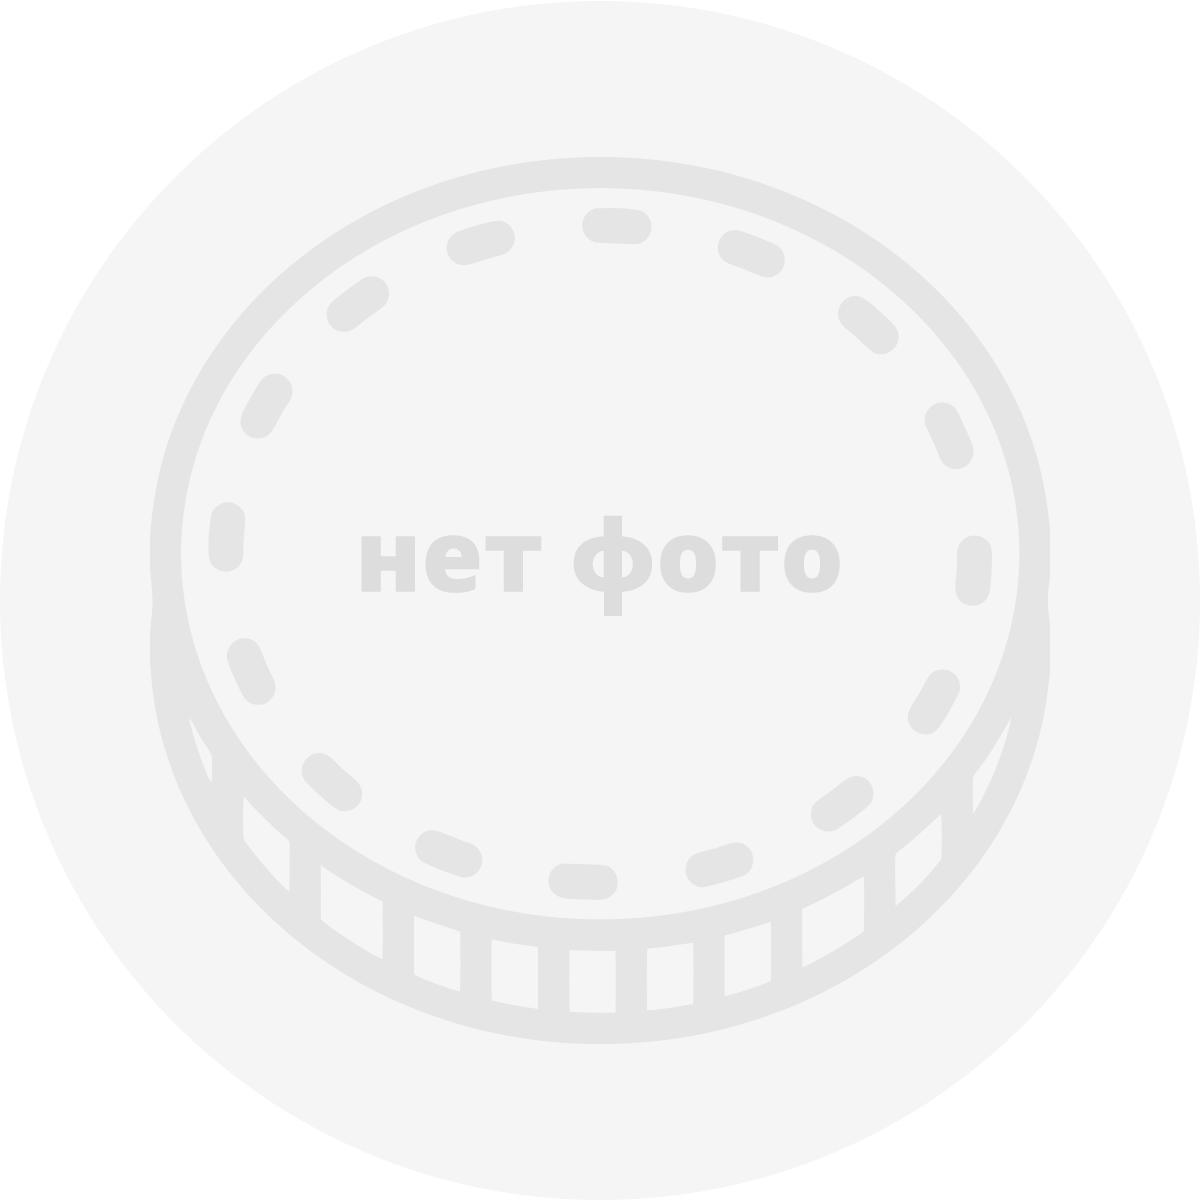 Таджикистан, Набор монет (2018 г.)